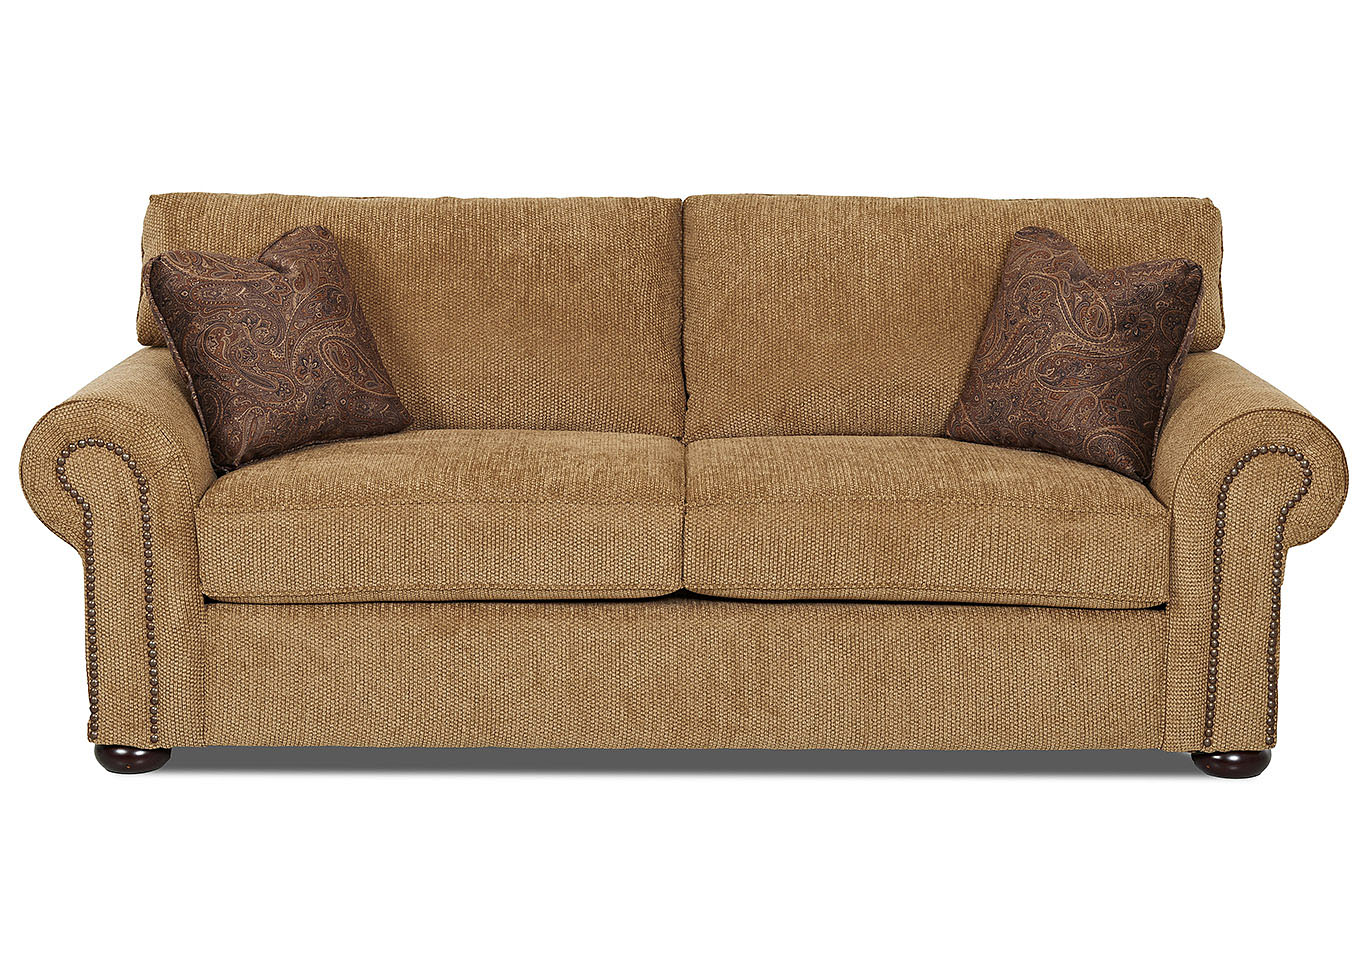 Best Buy Furniture and Mattress Sienna Light Brown Fabric Sofa